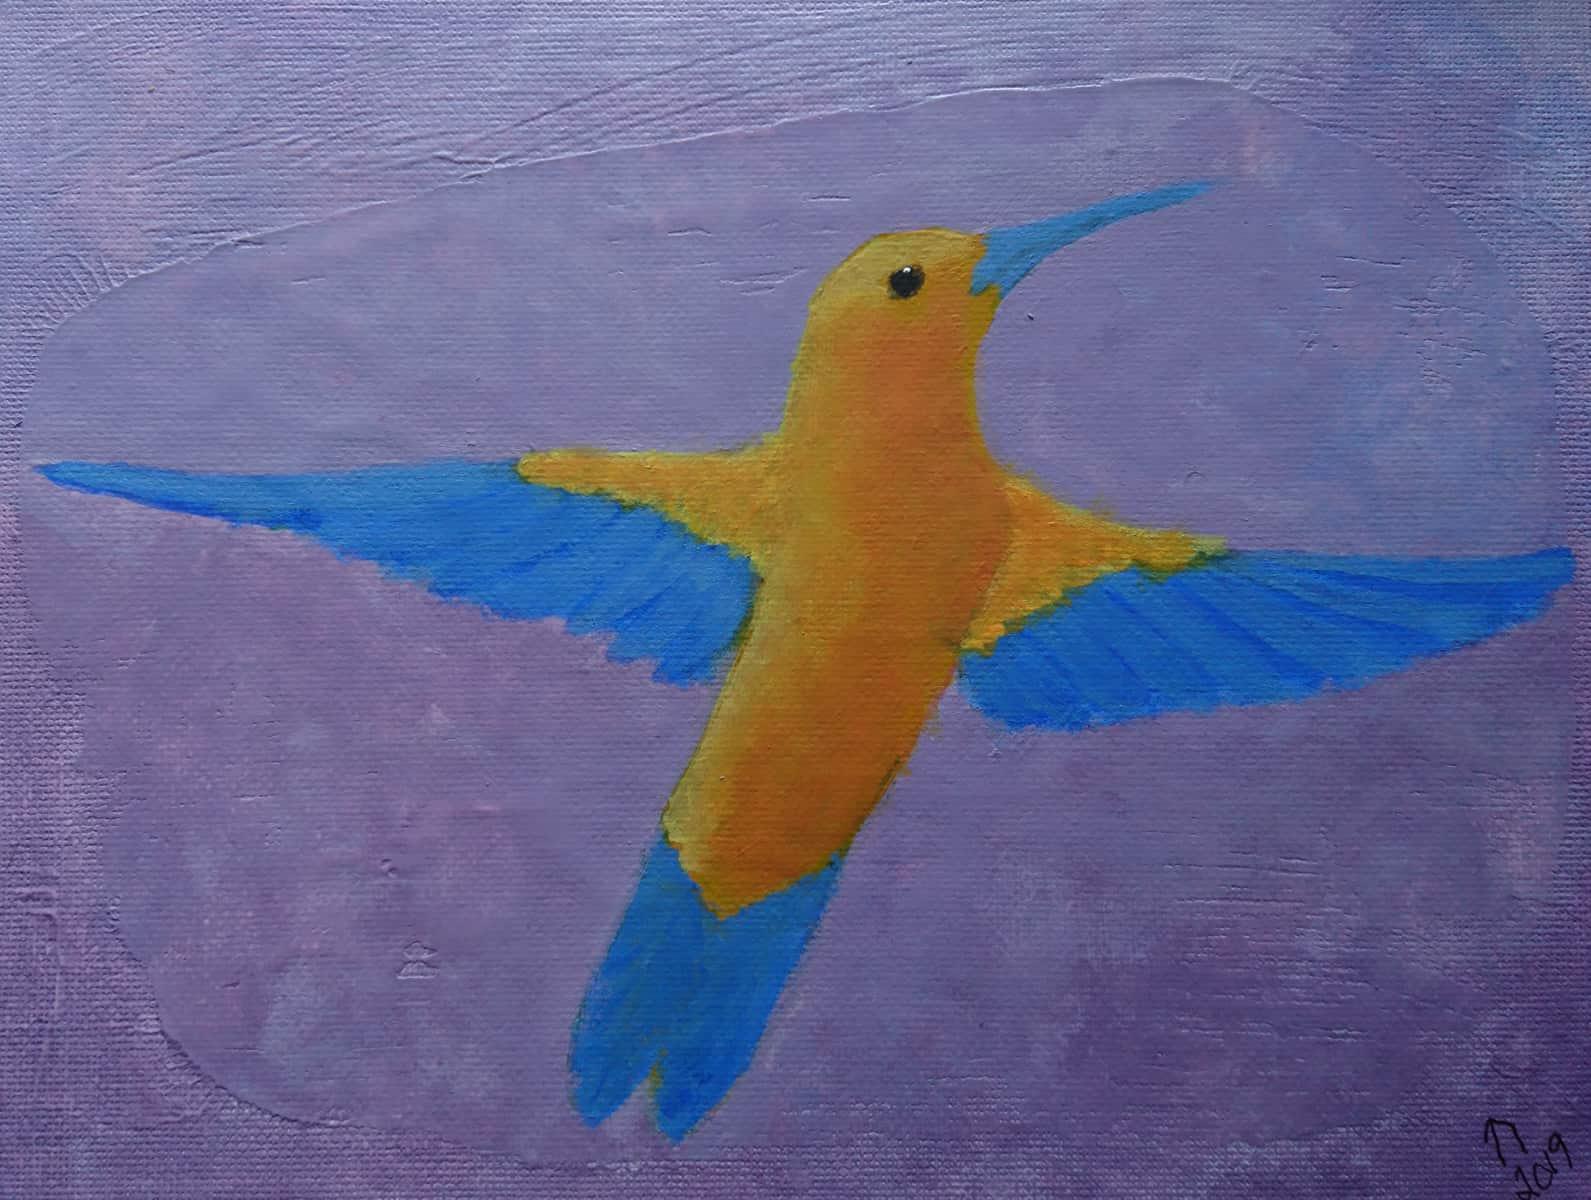 An Acrylic Painting of a Bird in Random Colors